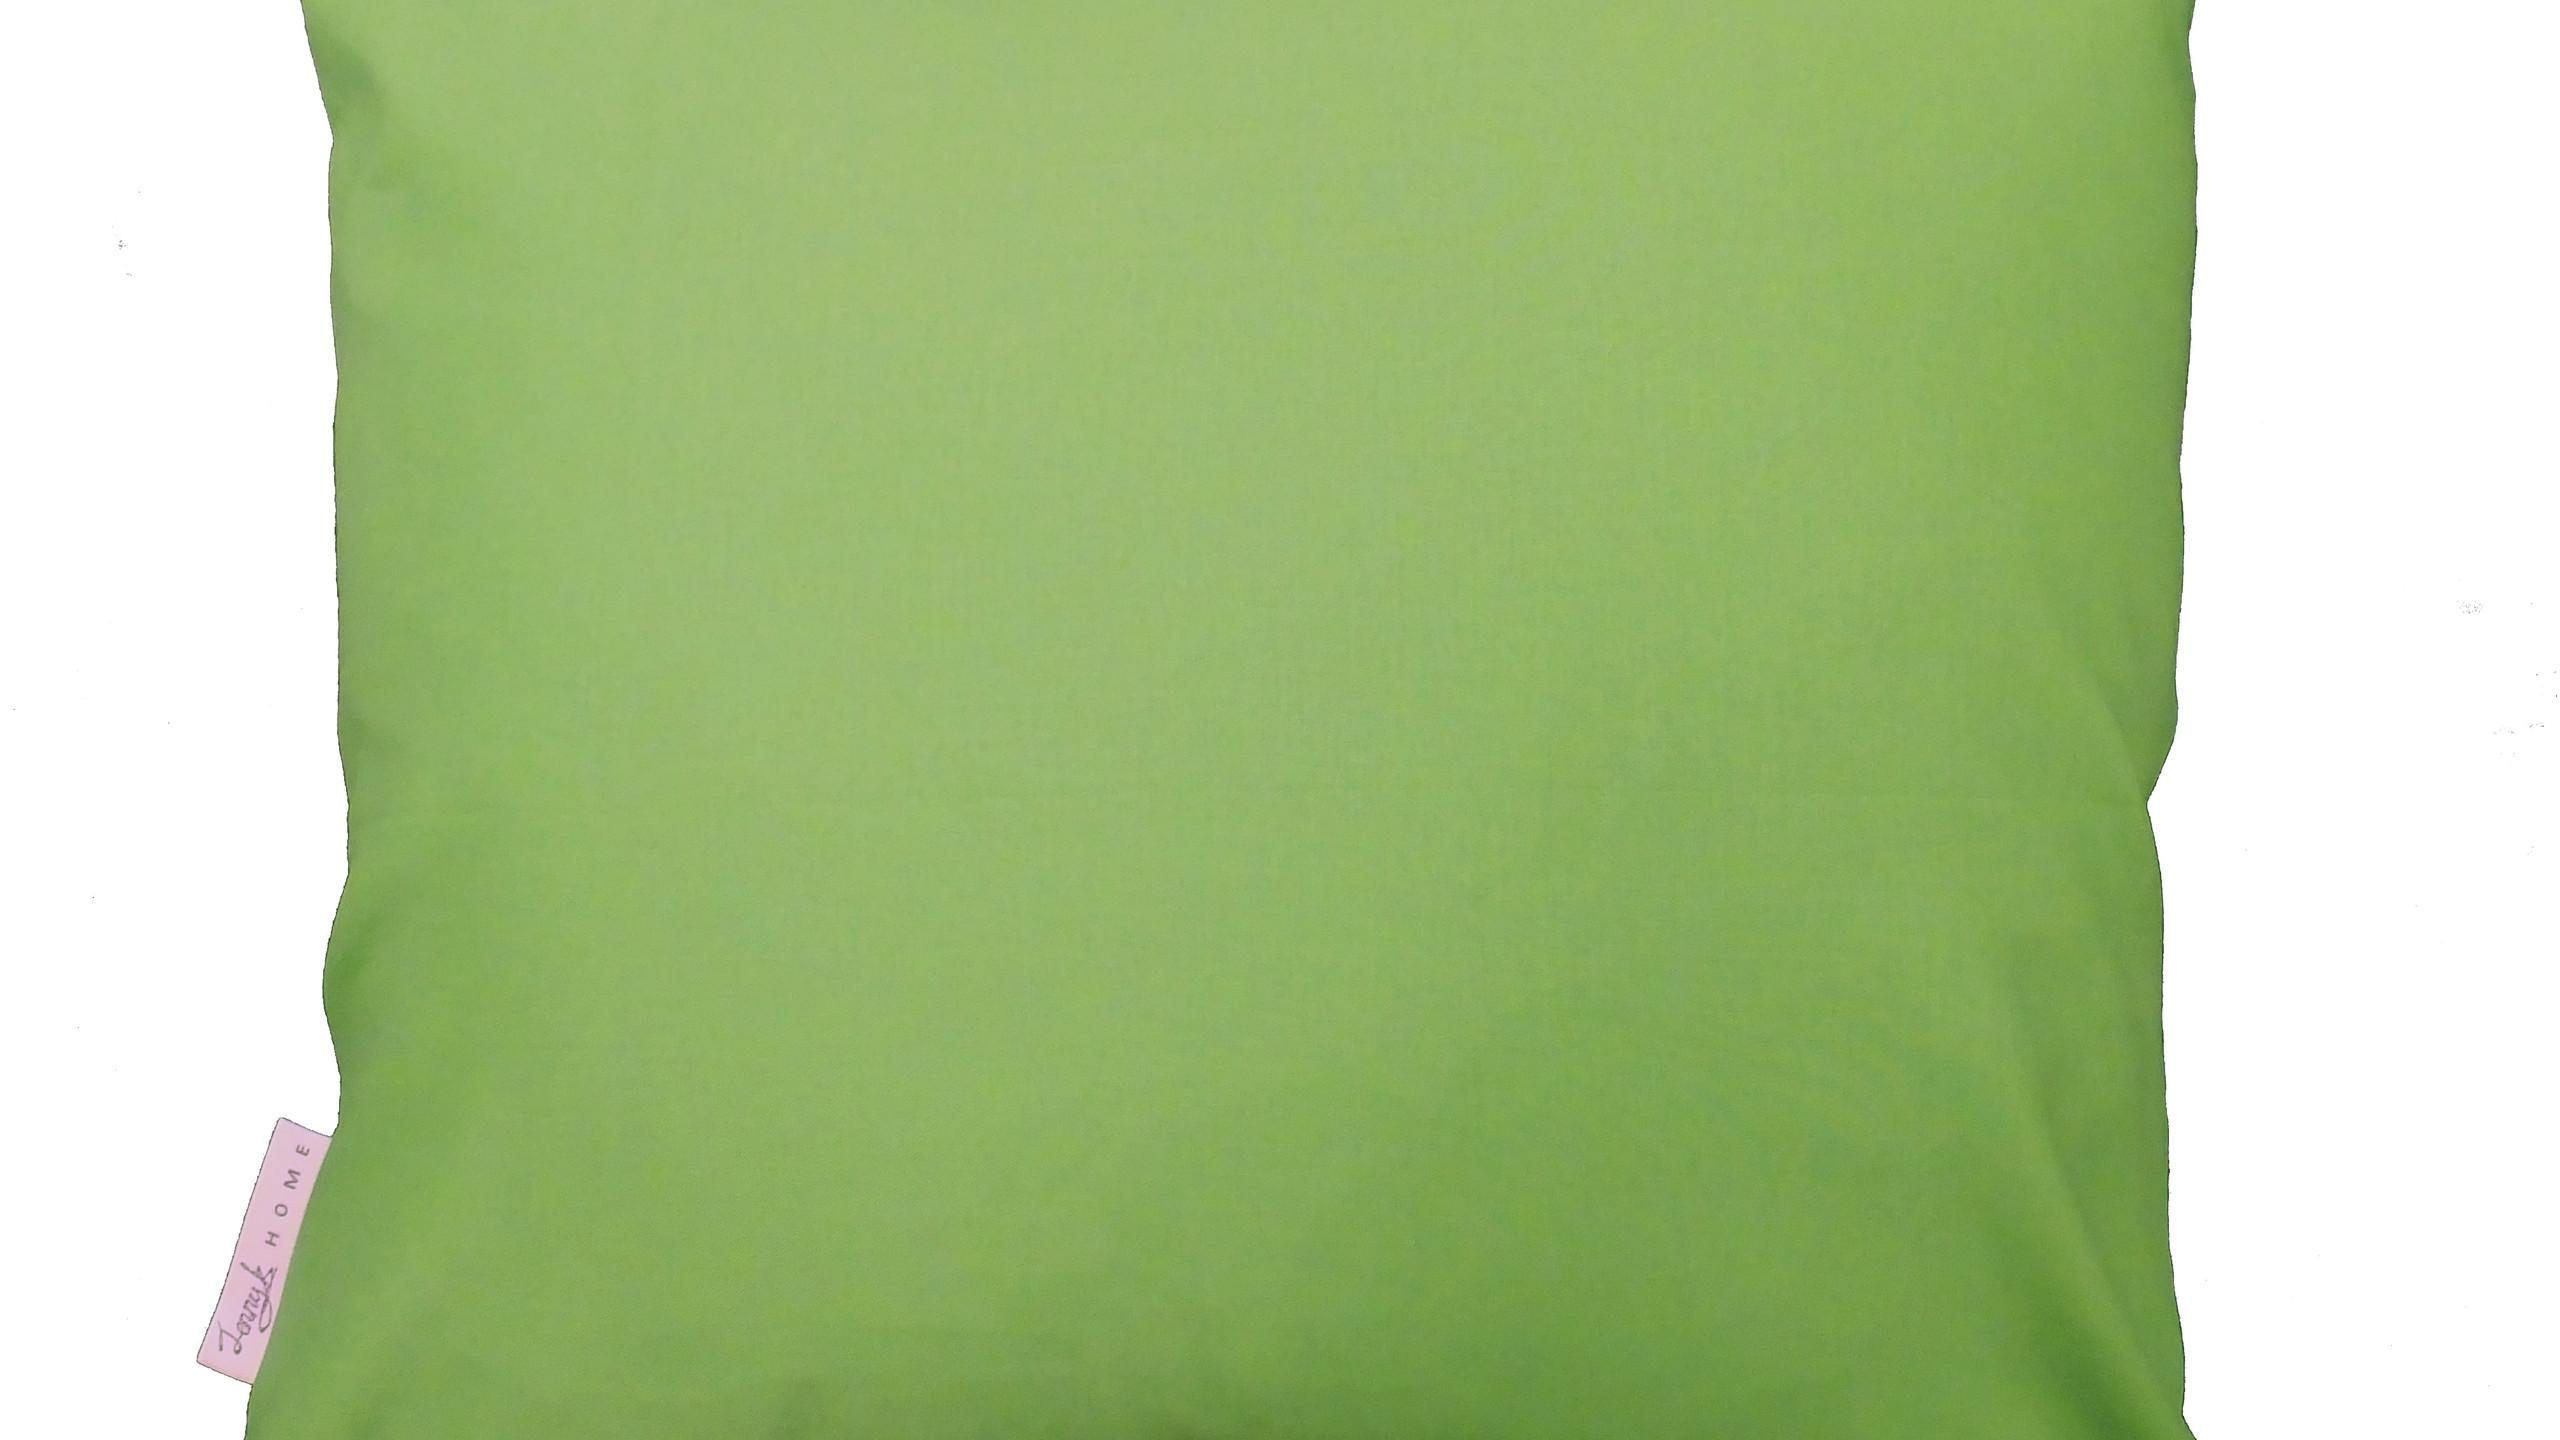 Jenny K Home Budgie Bird Cushion Pillow Aviary Colourful Handmade UK - Green back 2 - transparent-min